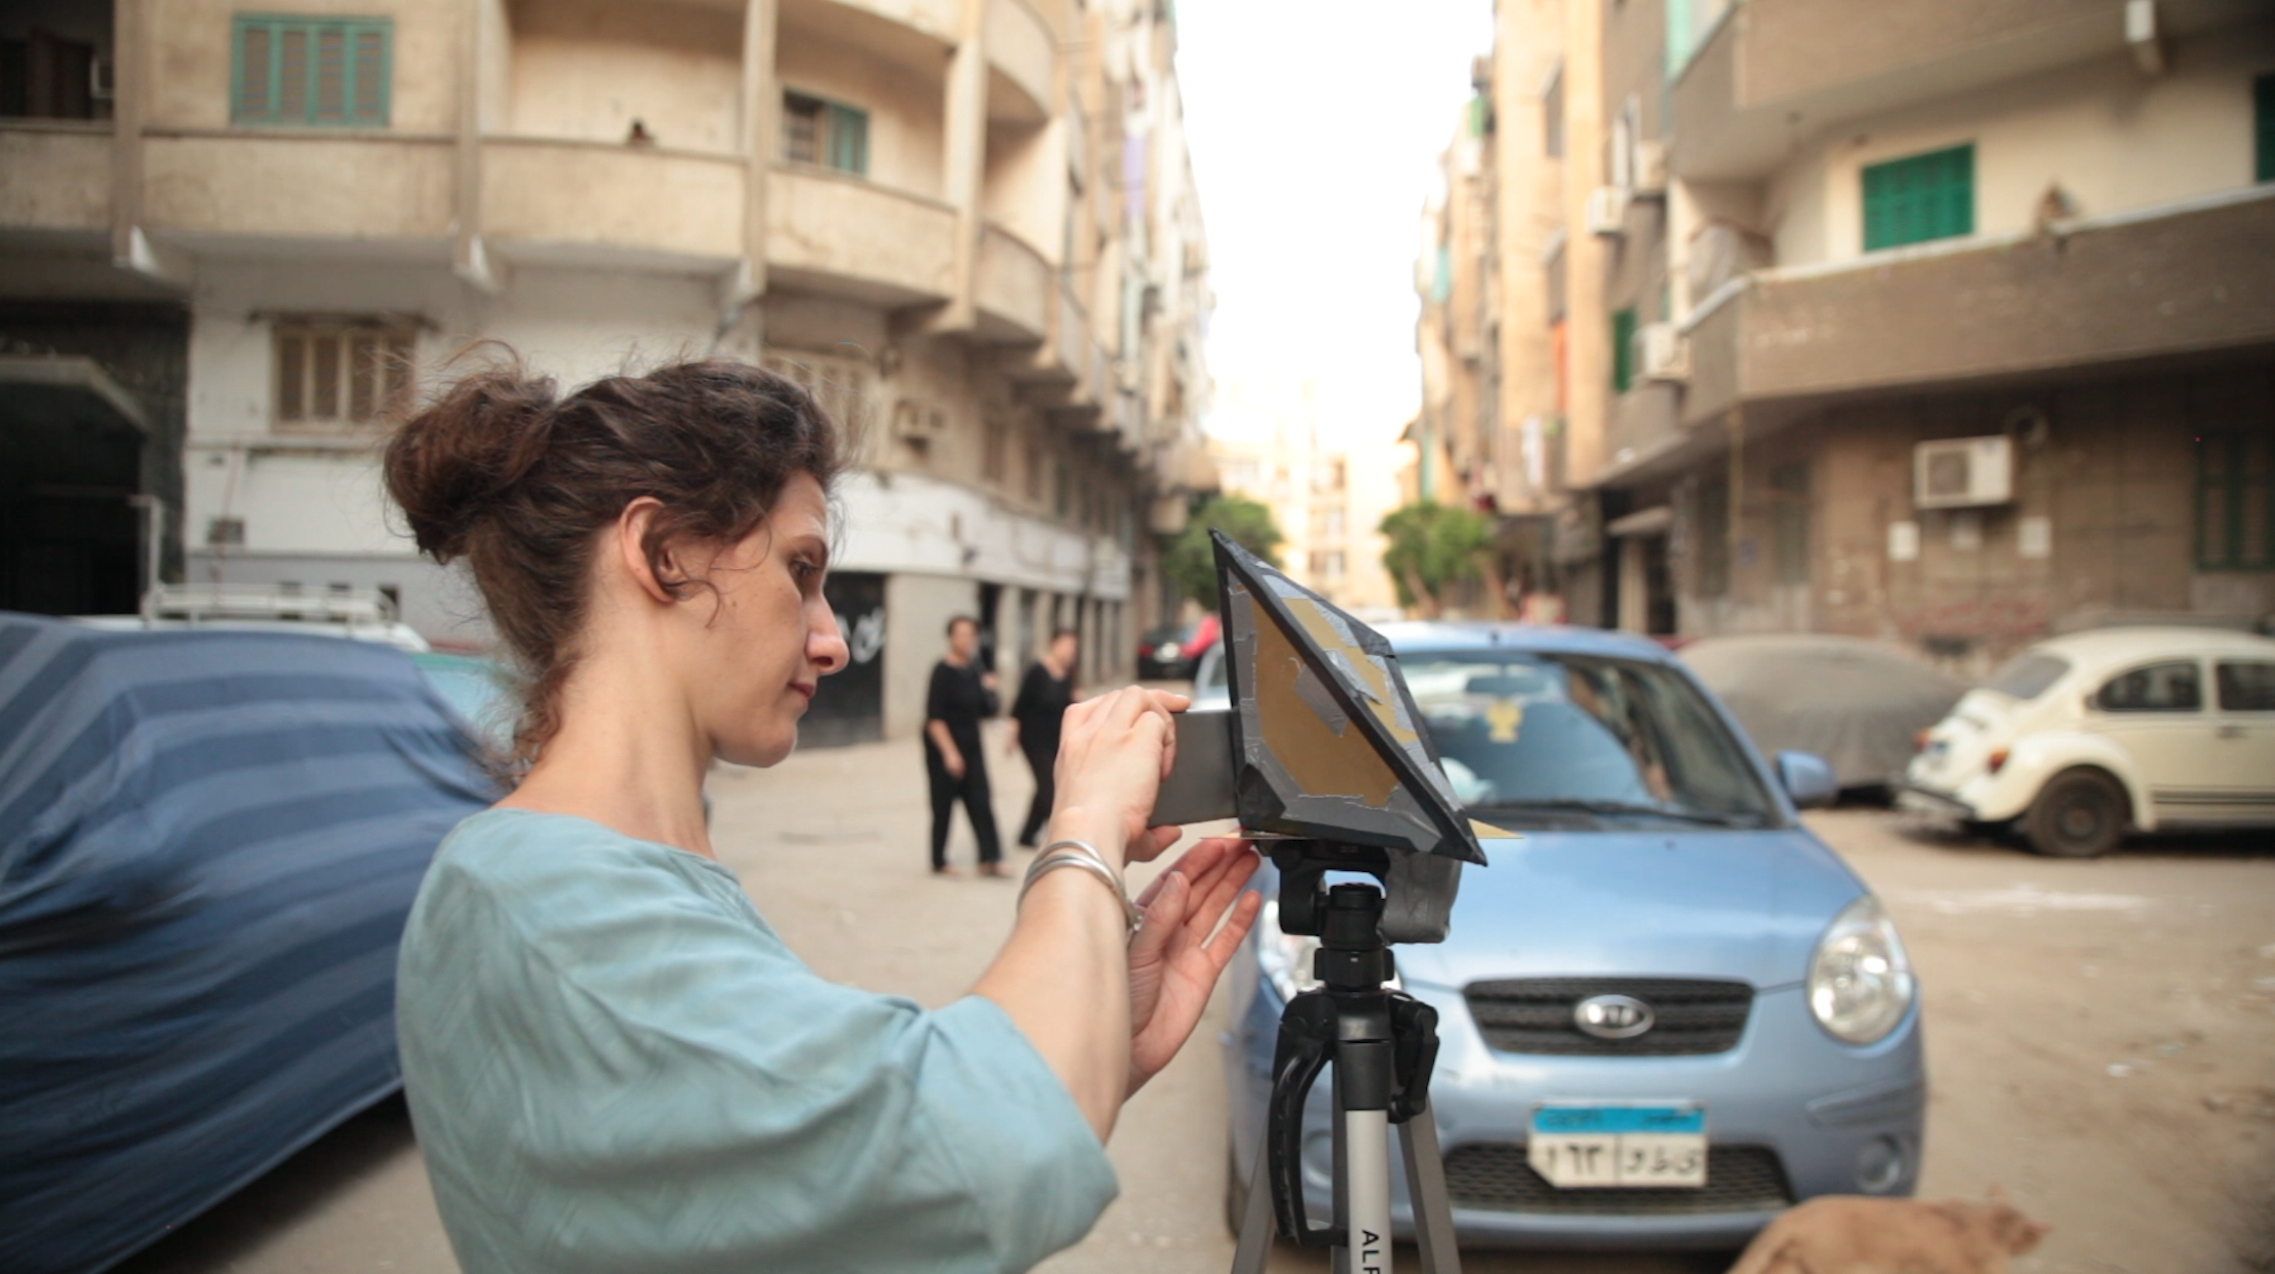 siba sahabi voor de documentary obscura